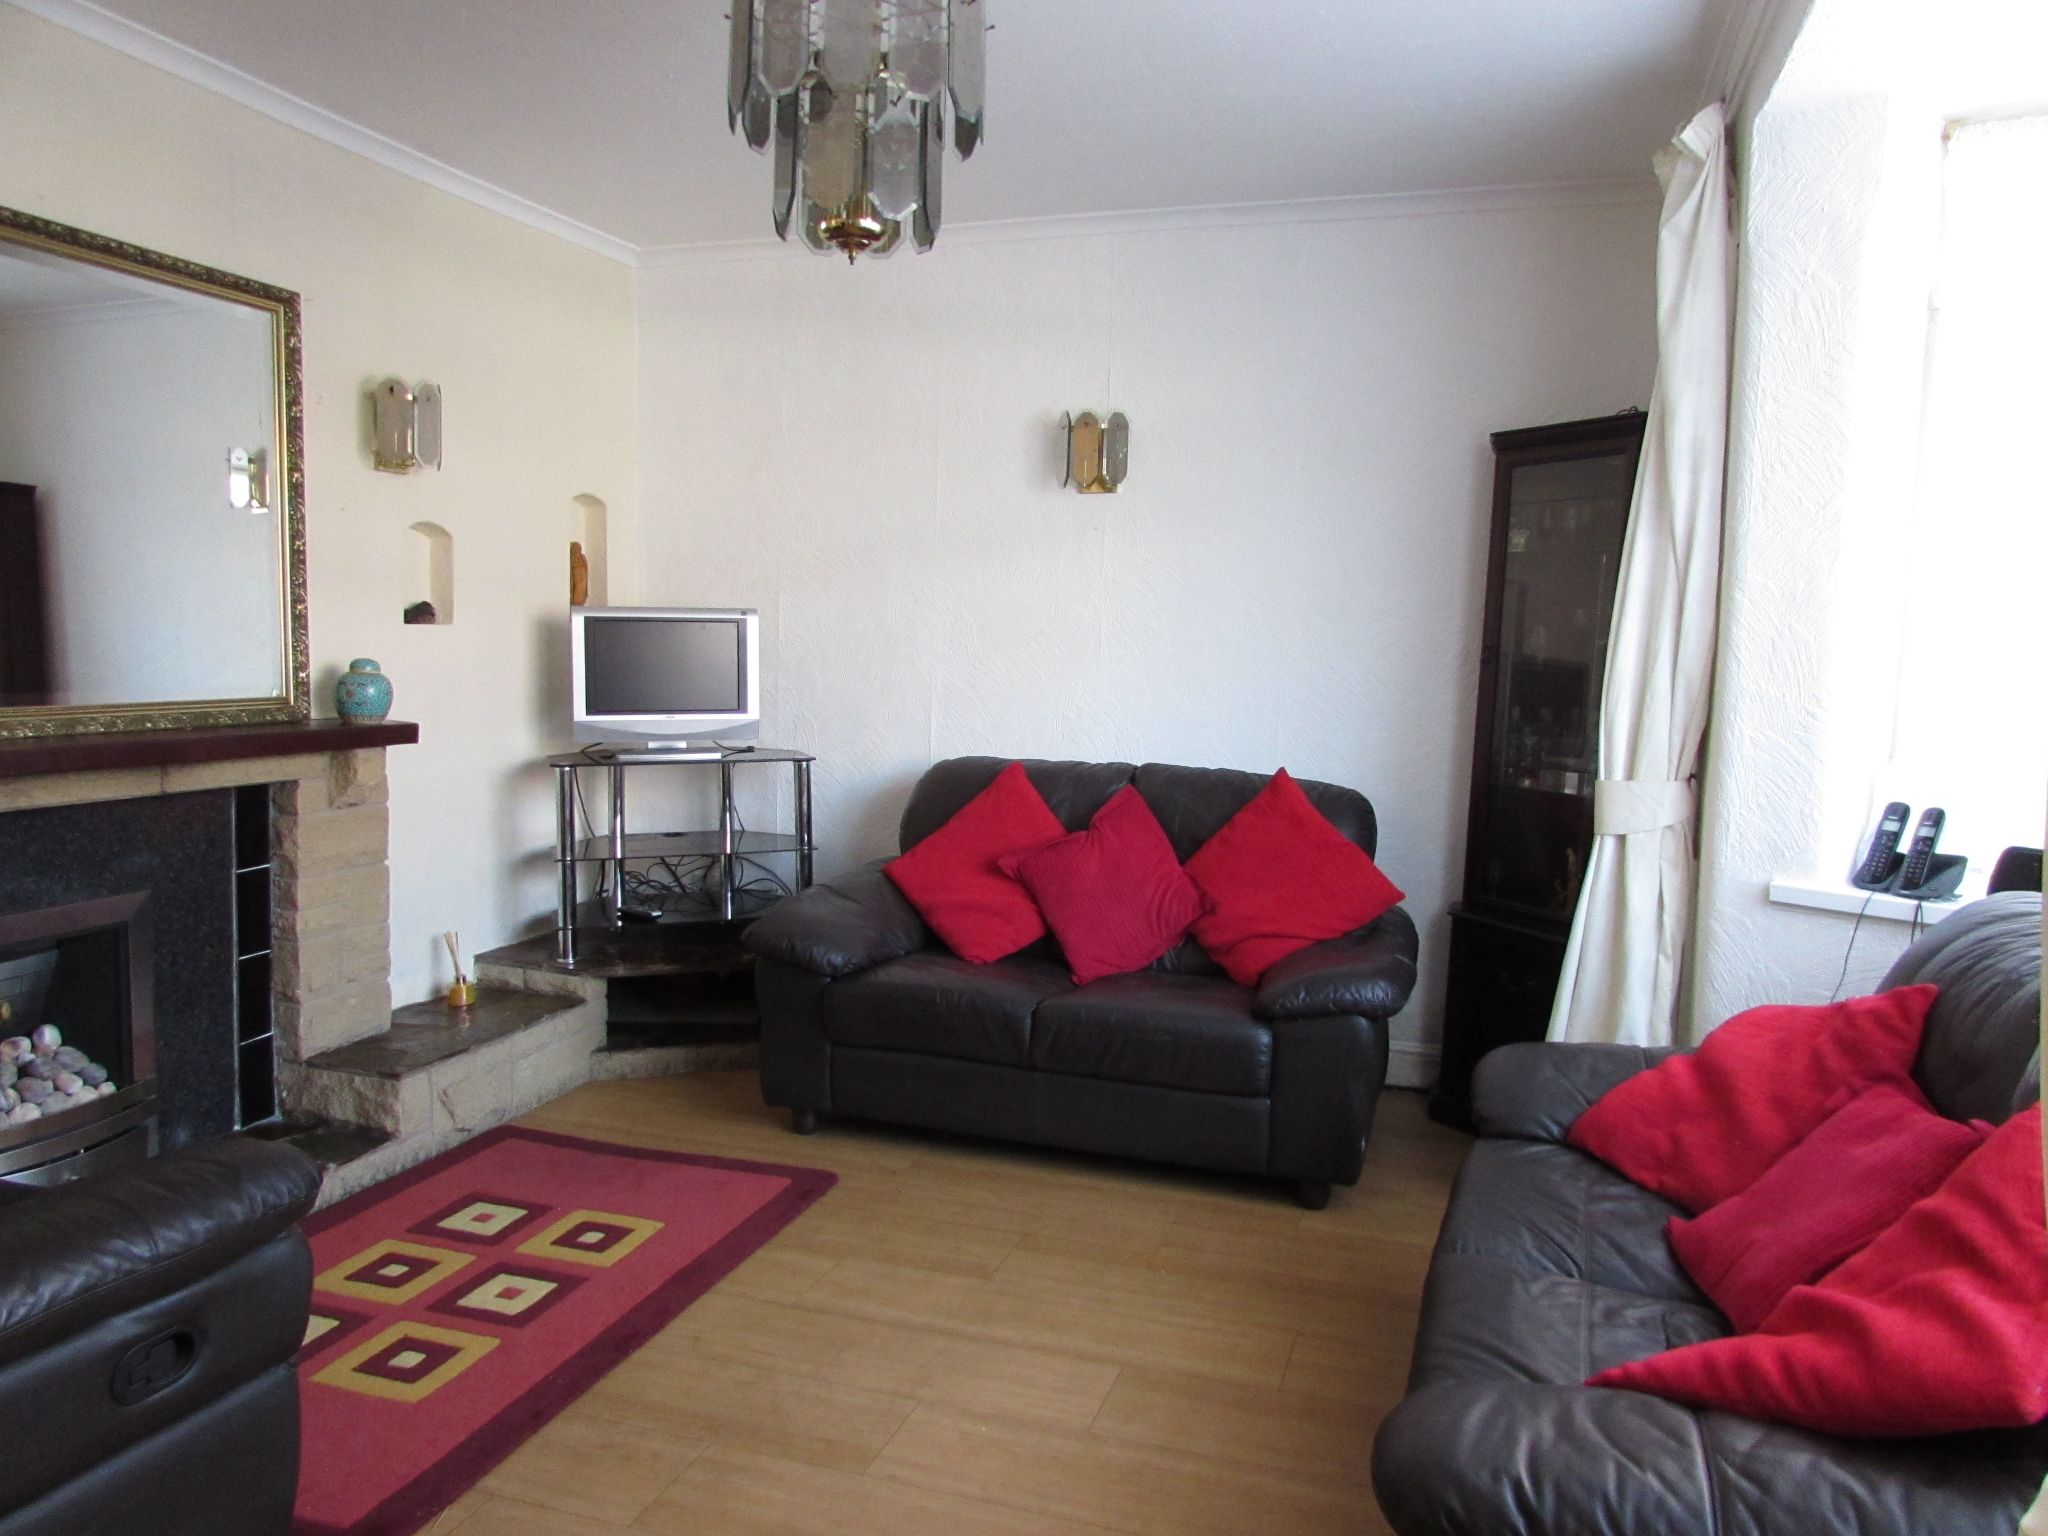 3 Bedroom Semi-detached House For Sale - livingroom